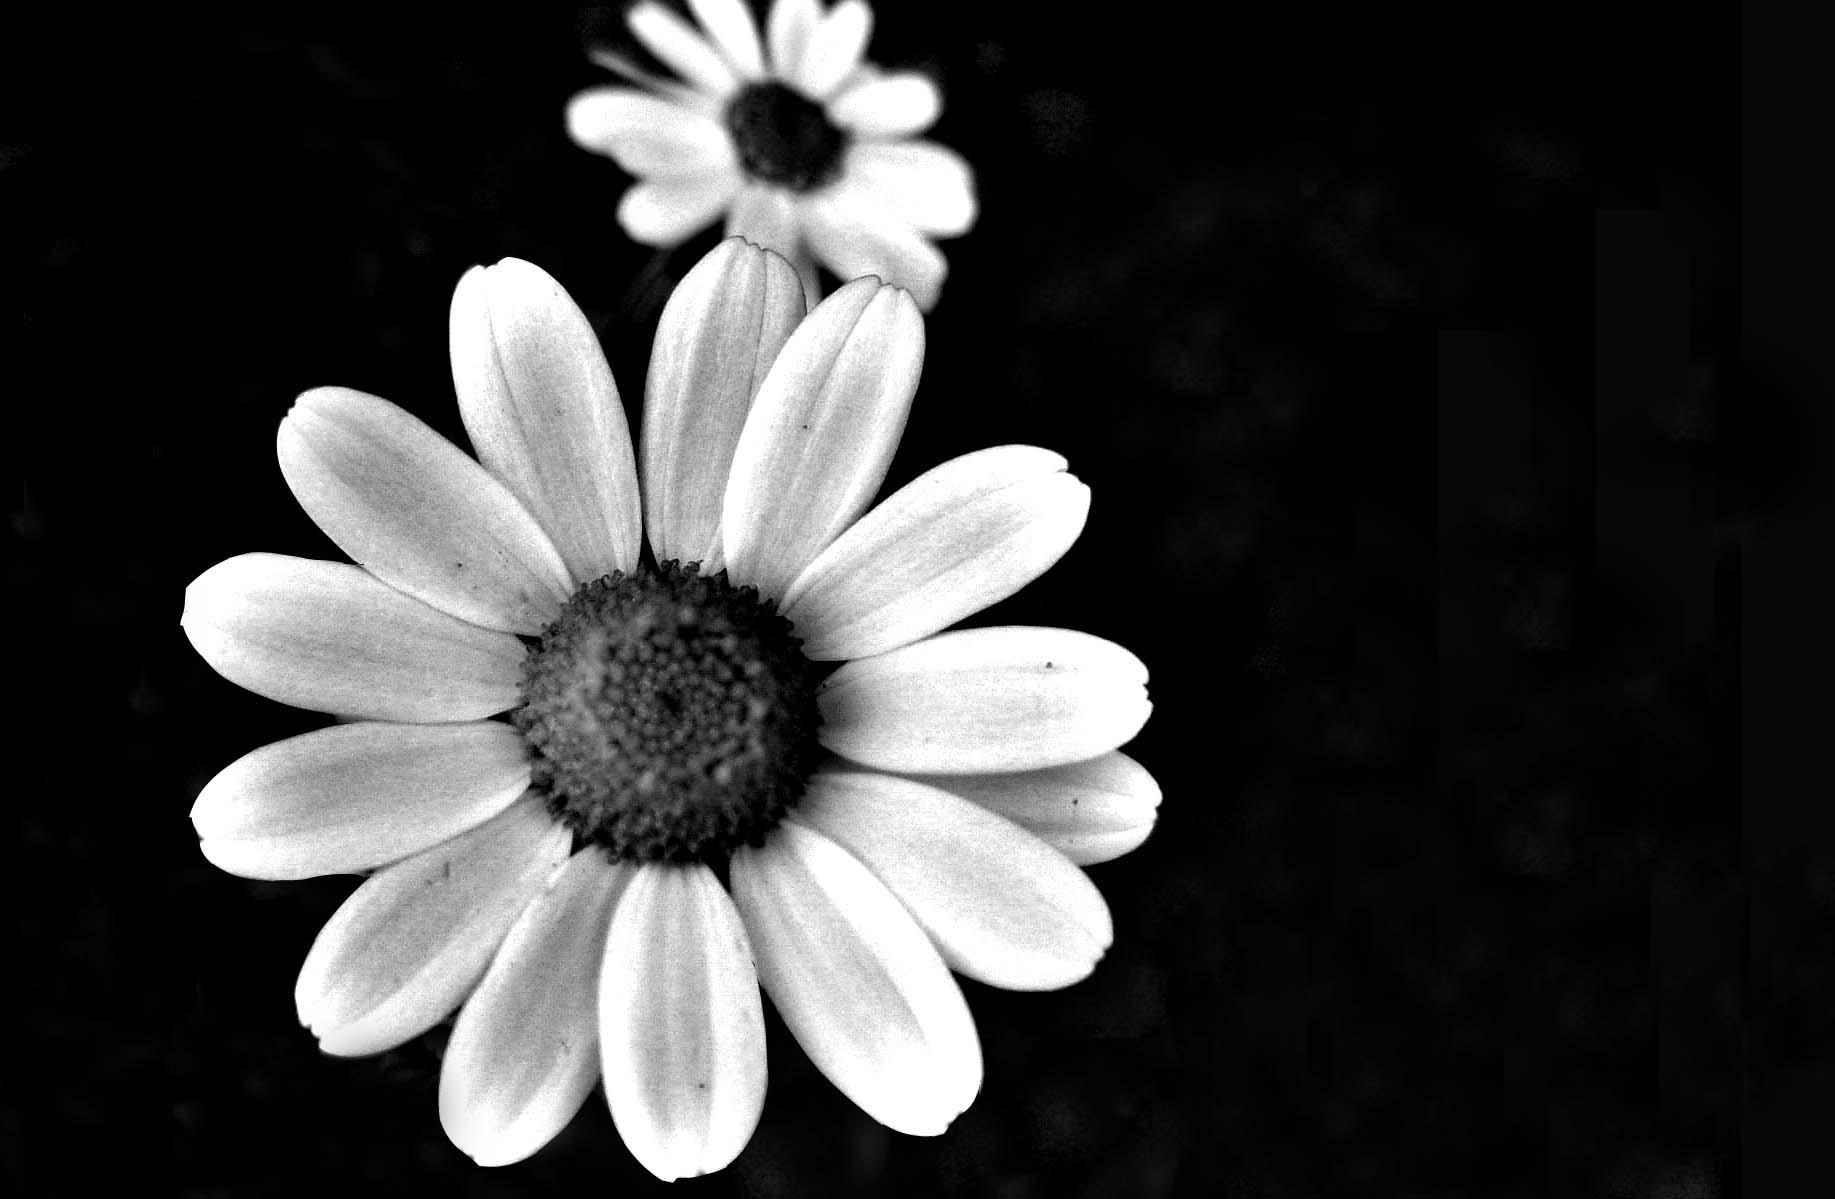 48 Black And White Wallpapers Tumblr On Wallpapersafari